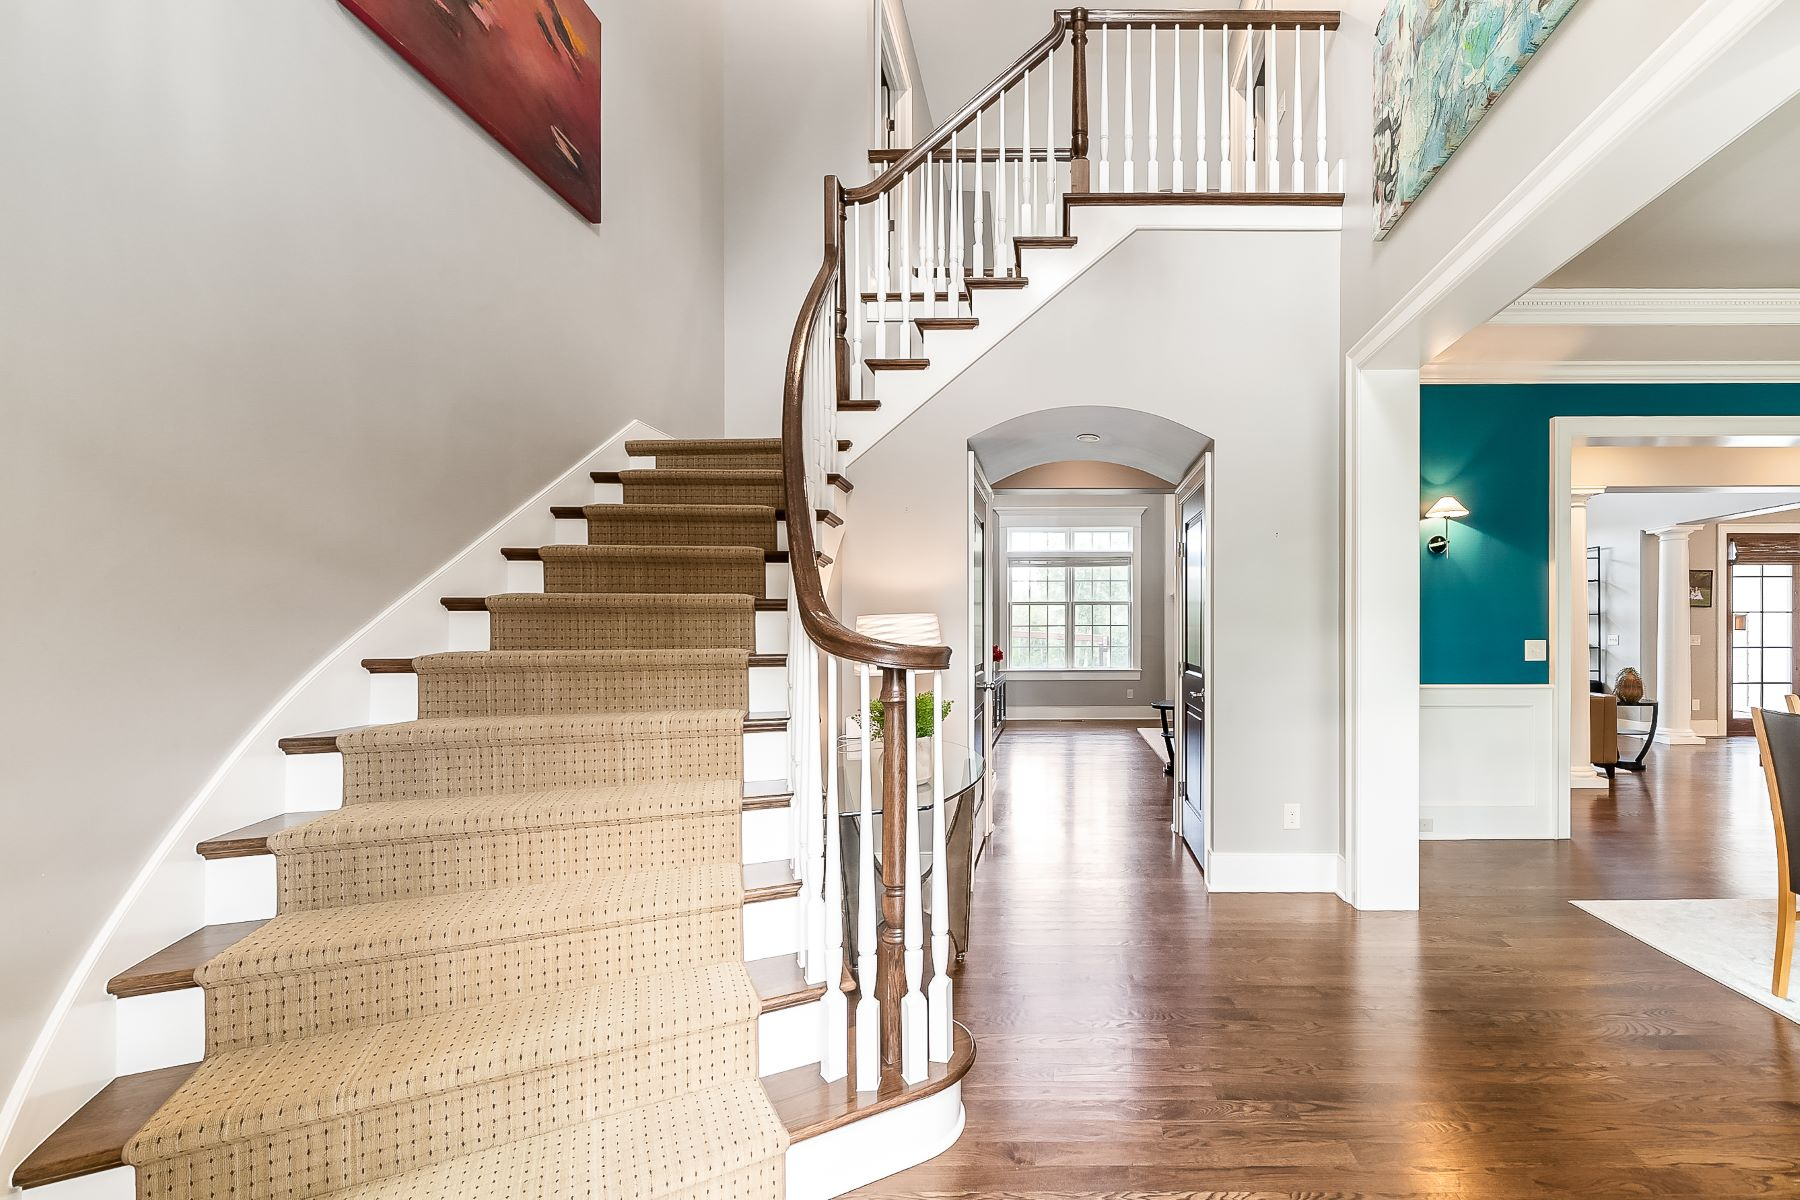 Single Family Homes for Sale at 2434 Lane Road Upper Arlington, Ohio 43220 United States